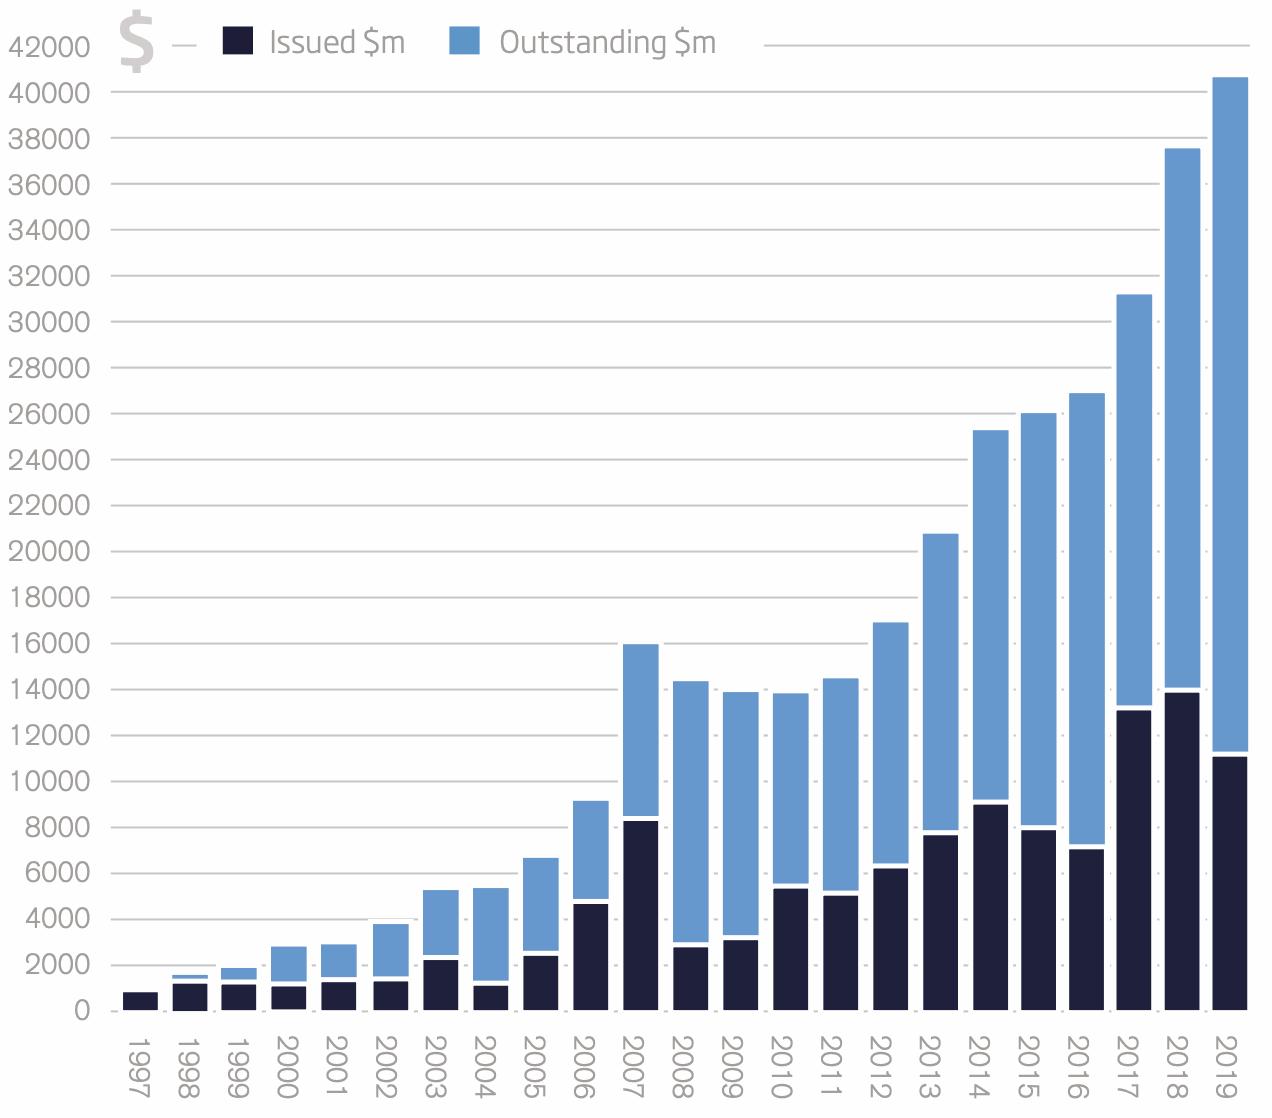 2019-catastrophe-bond-ils-issuance-year